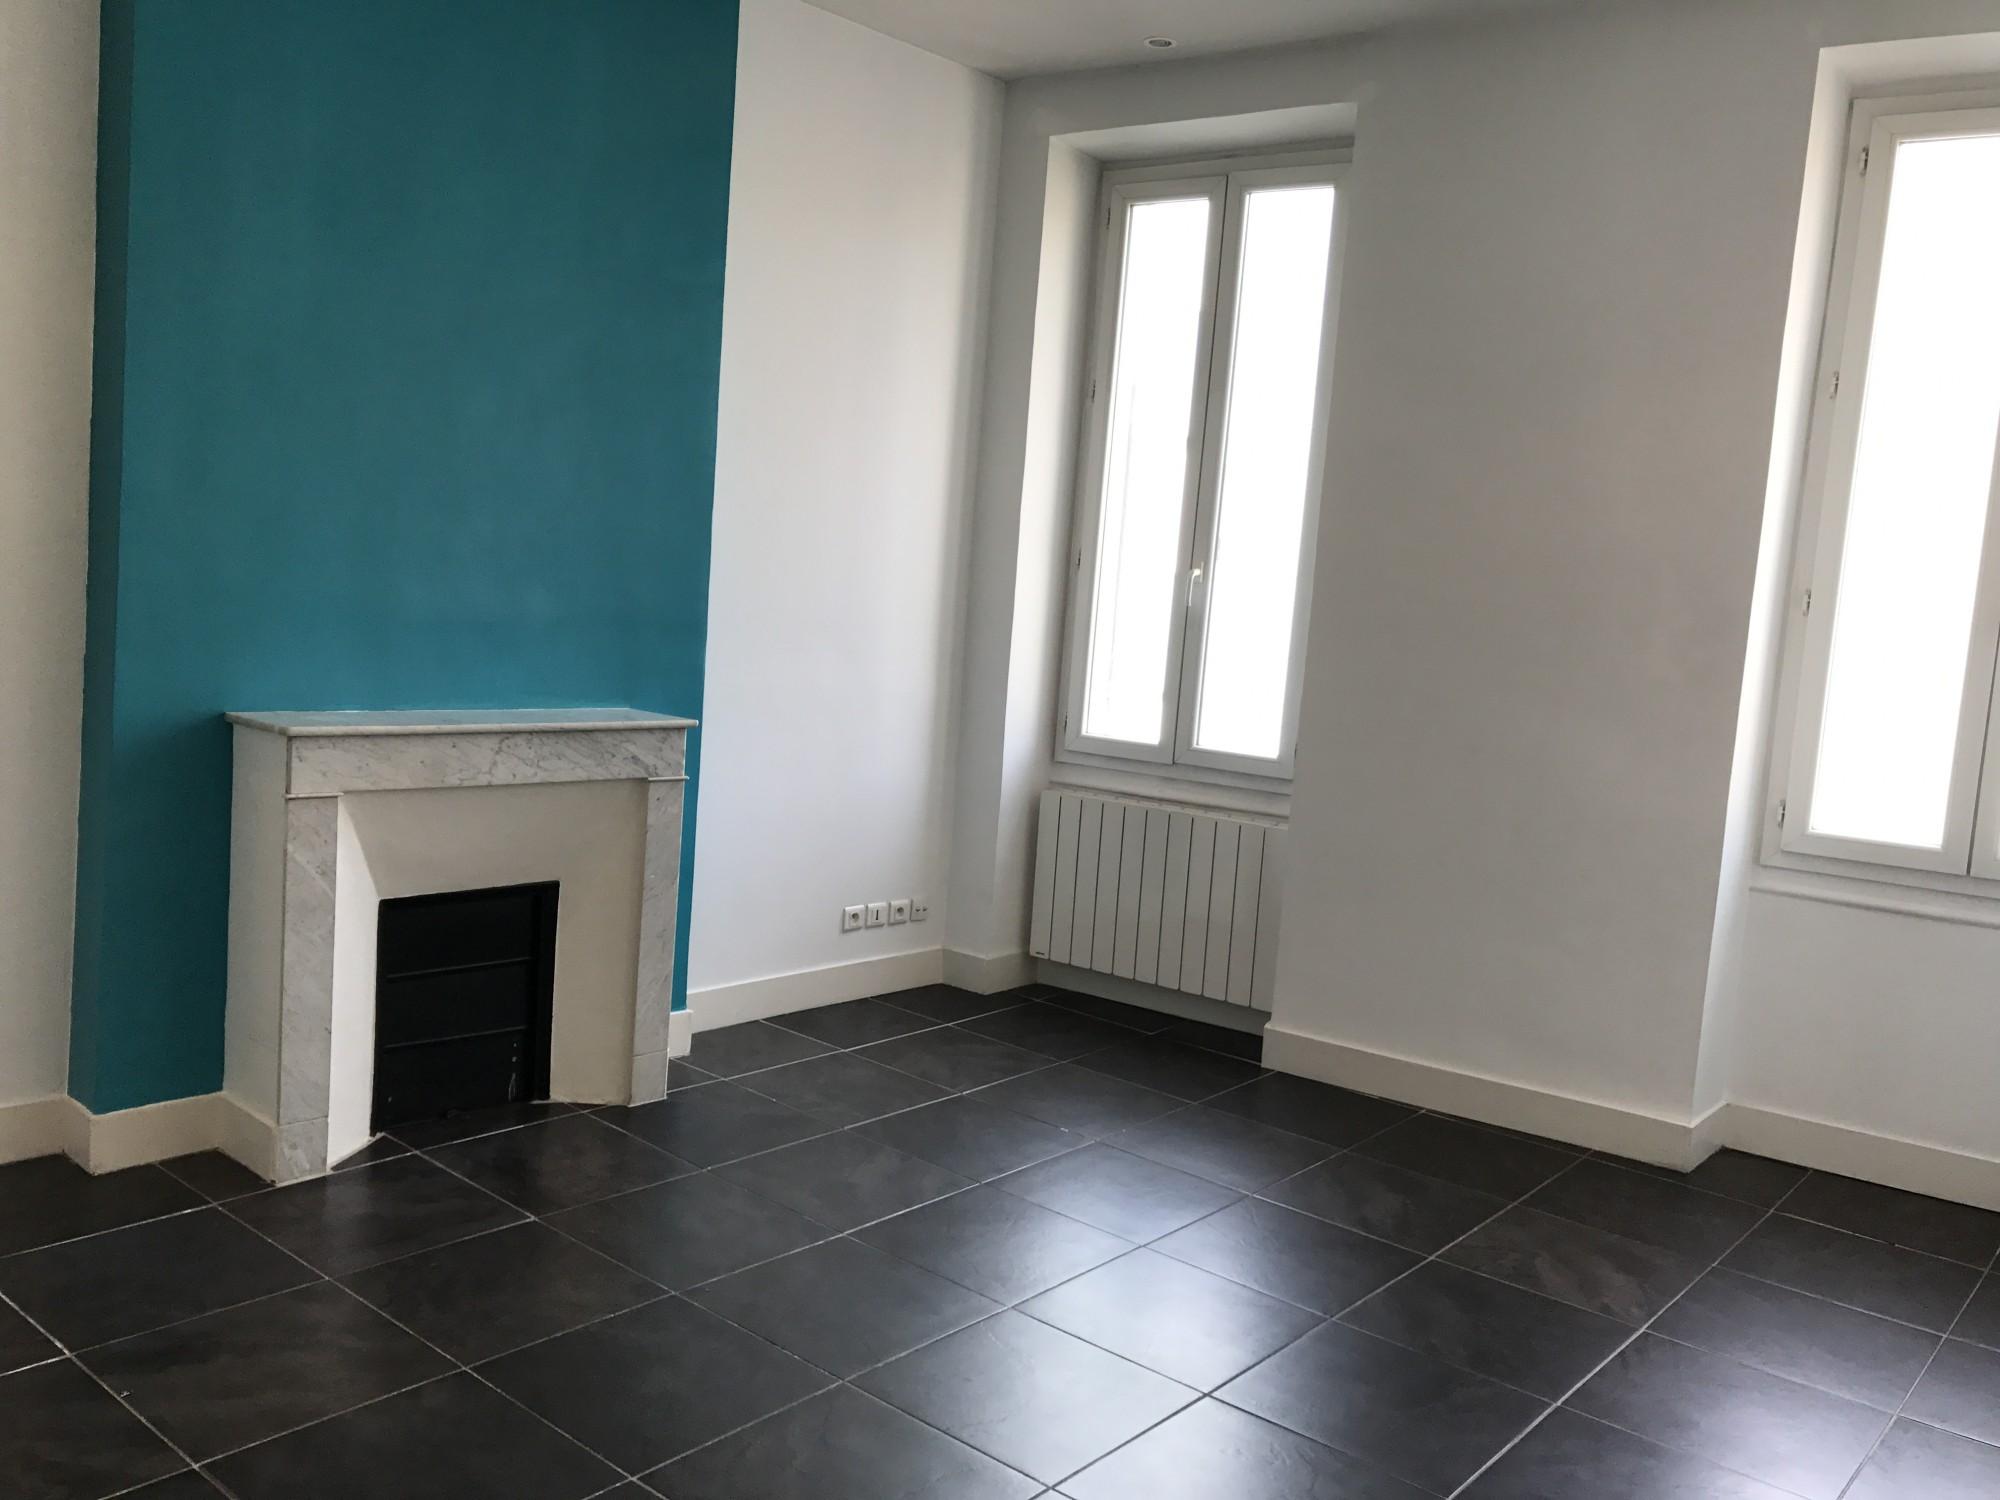 Locations appartement t2 f2 marseille 13005 rue for Vente appartement marseille 13005 terrasse